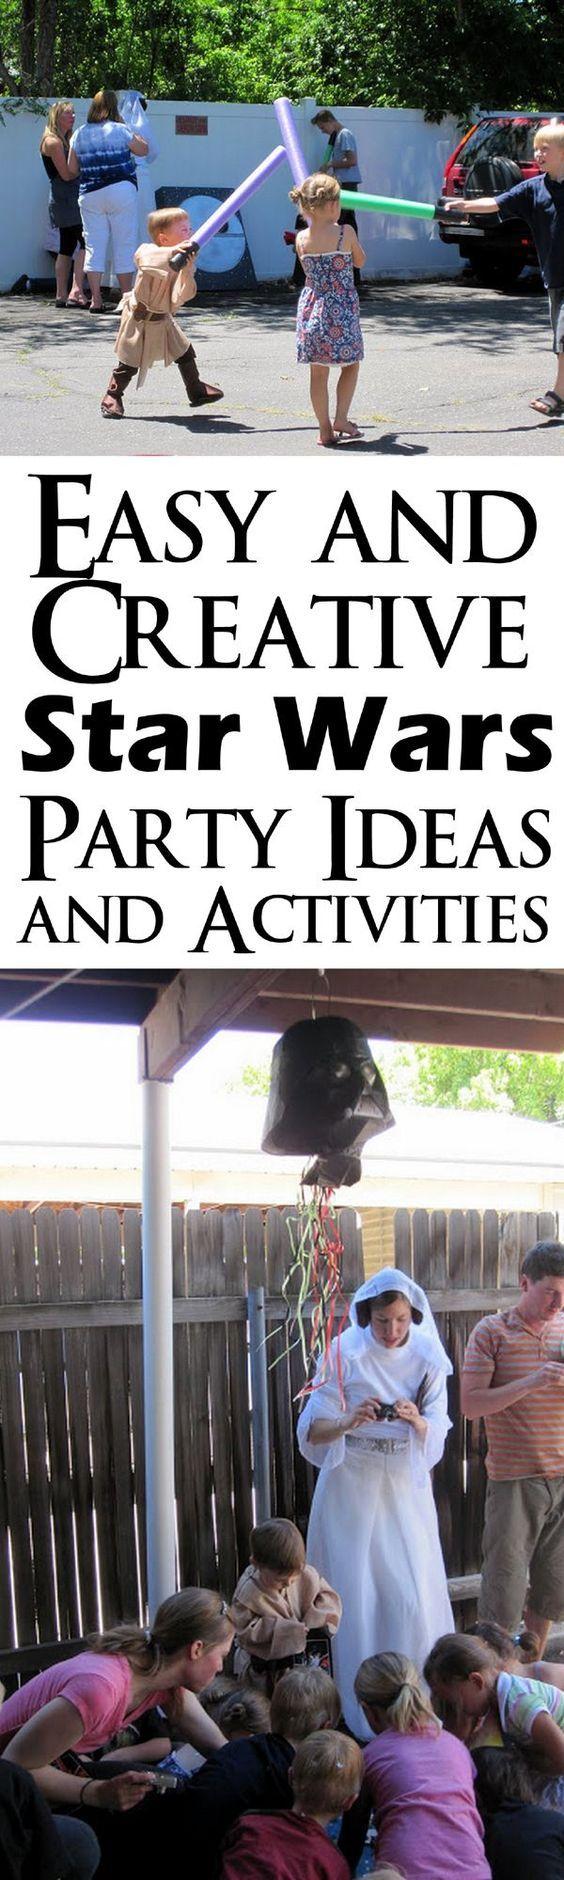 Toy box metal decor wall art shop play children store a180 ebay - Star Wars Birthday Party